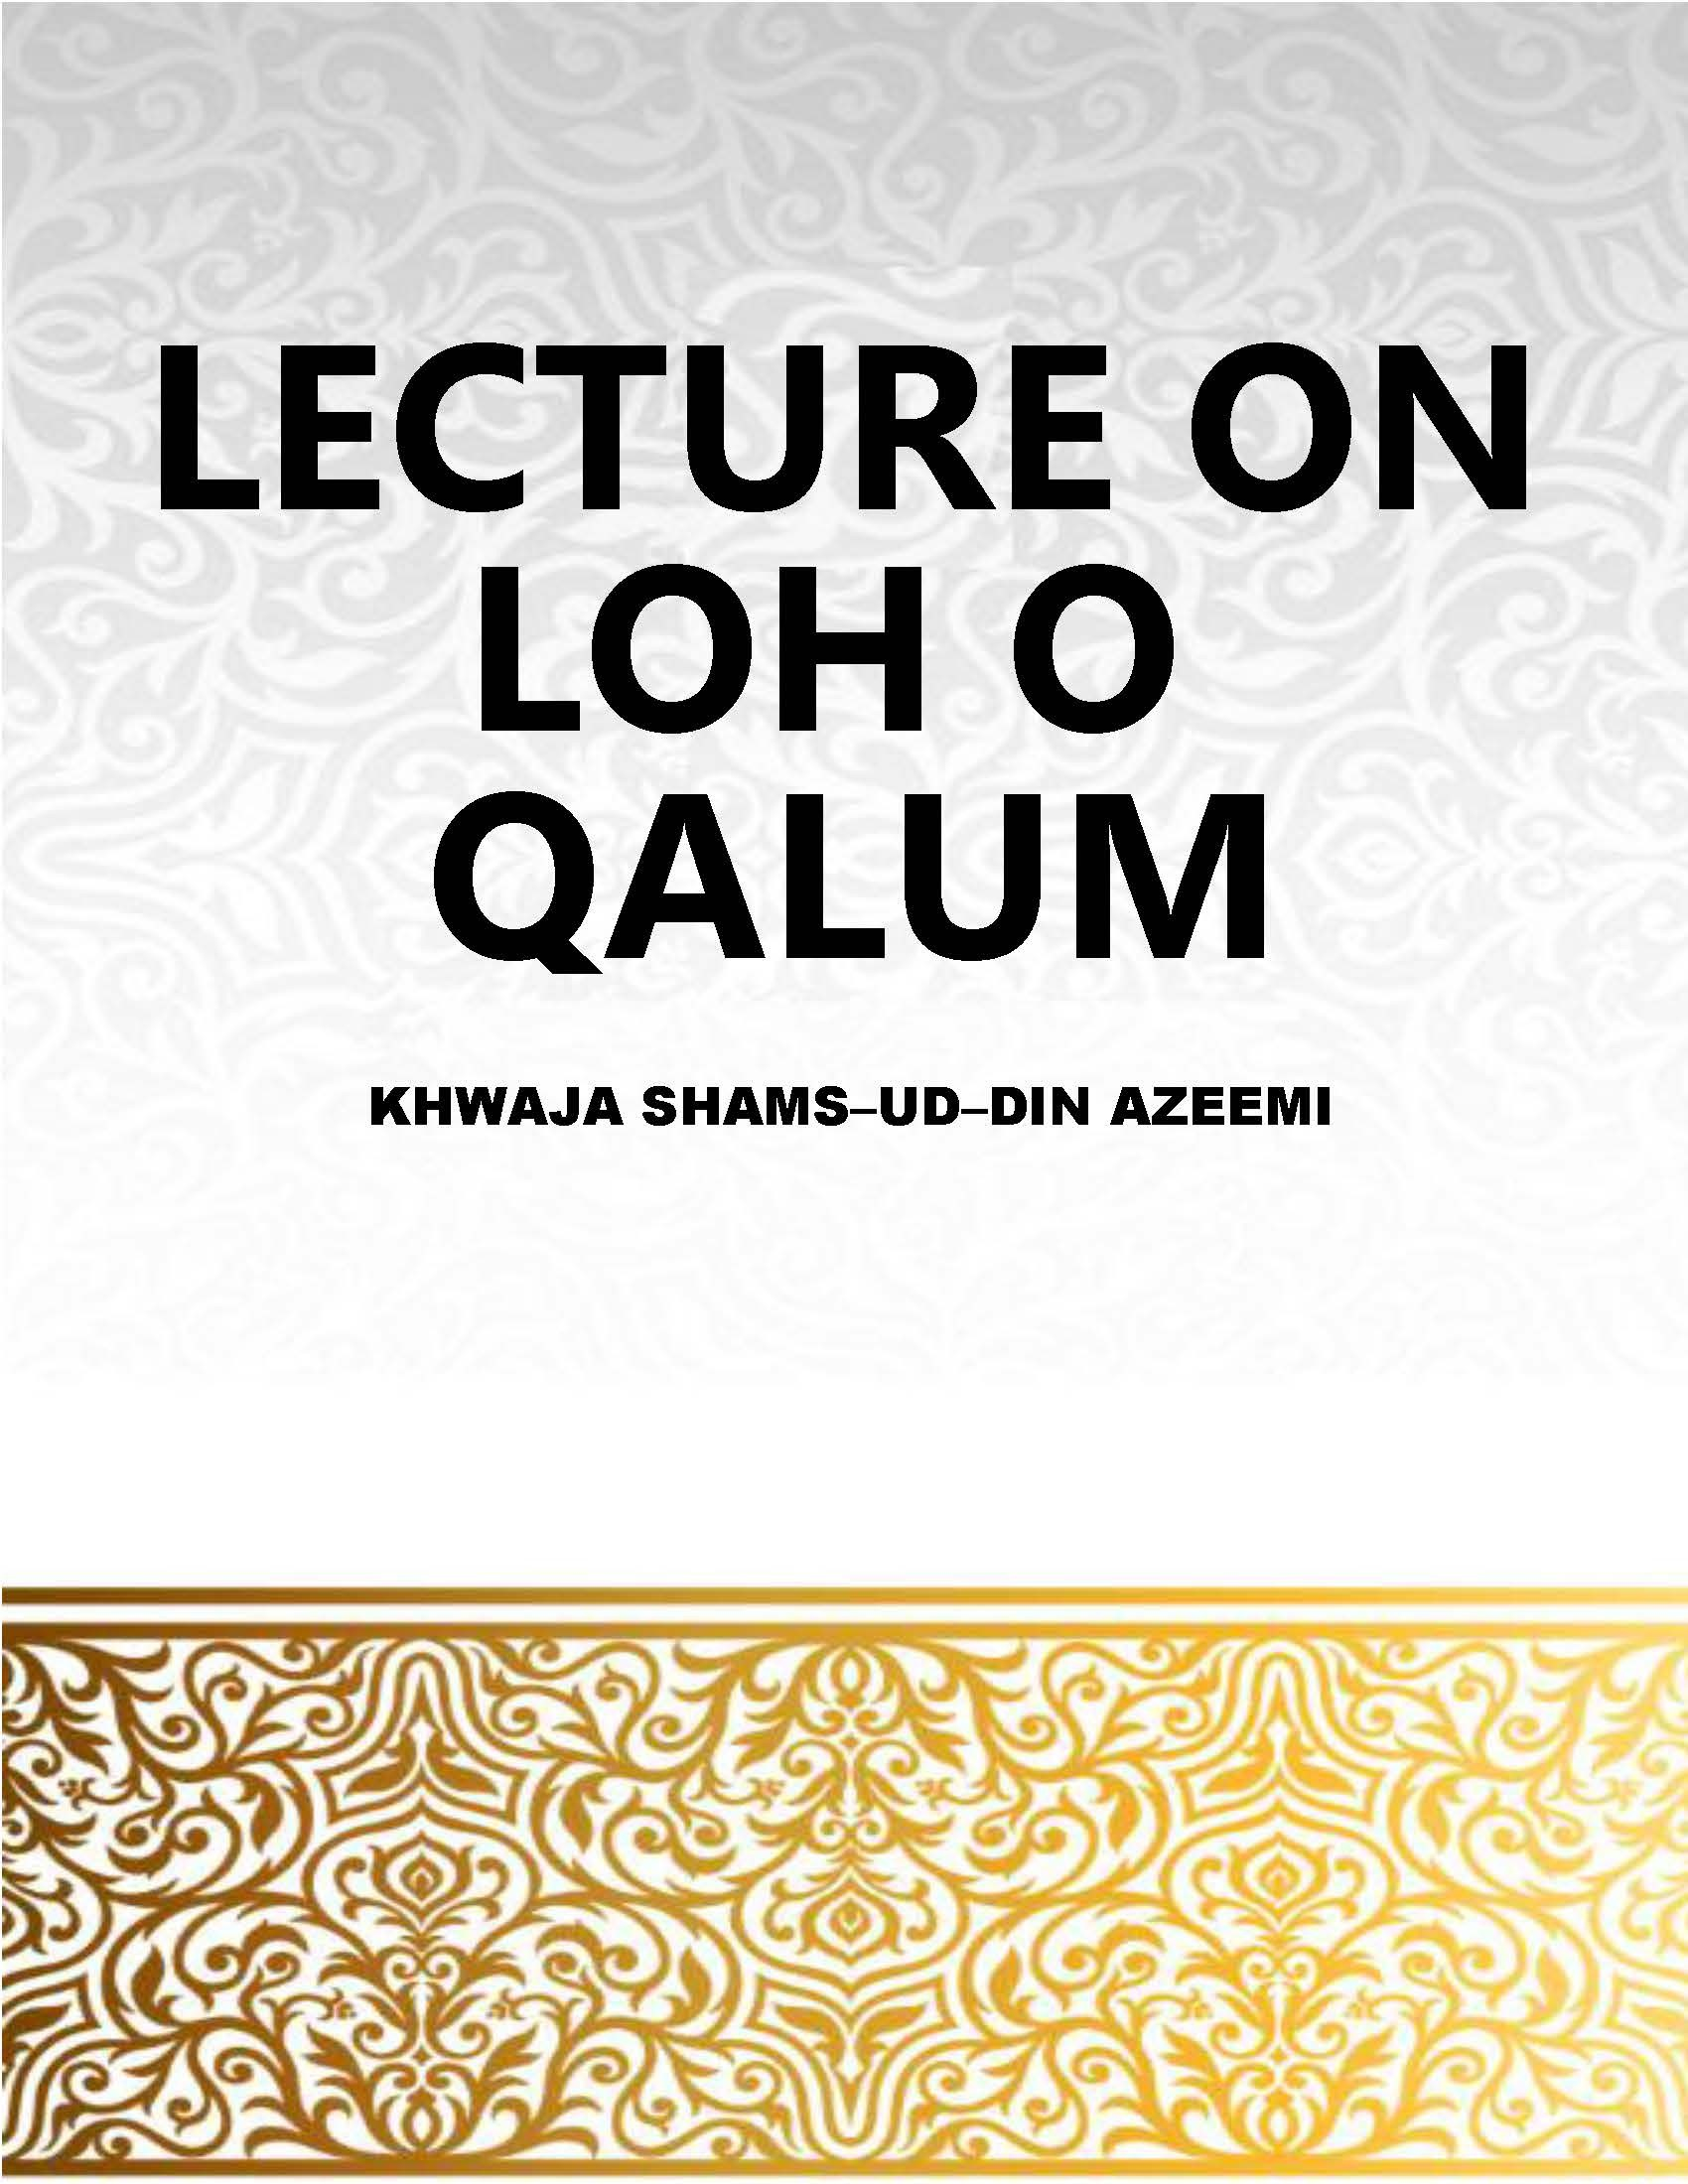 LECTURE ON LOH O QALUM